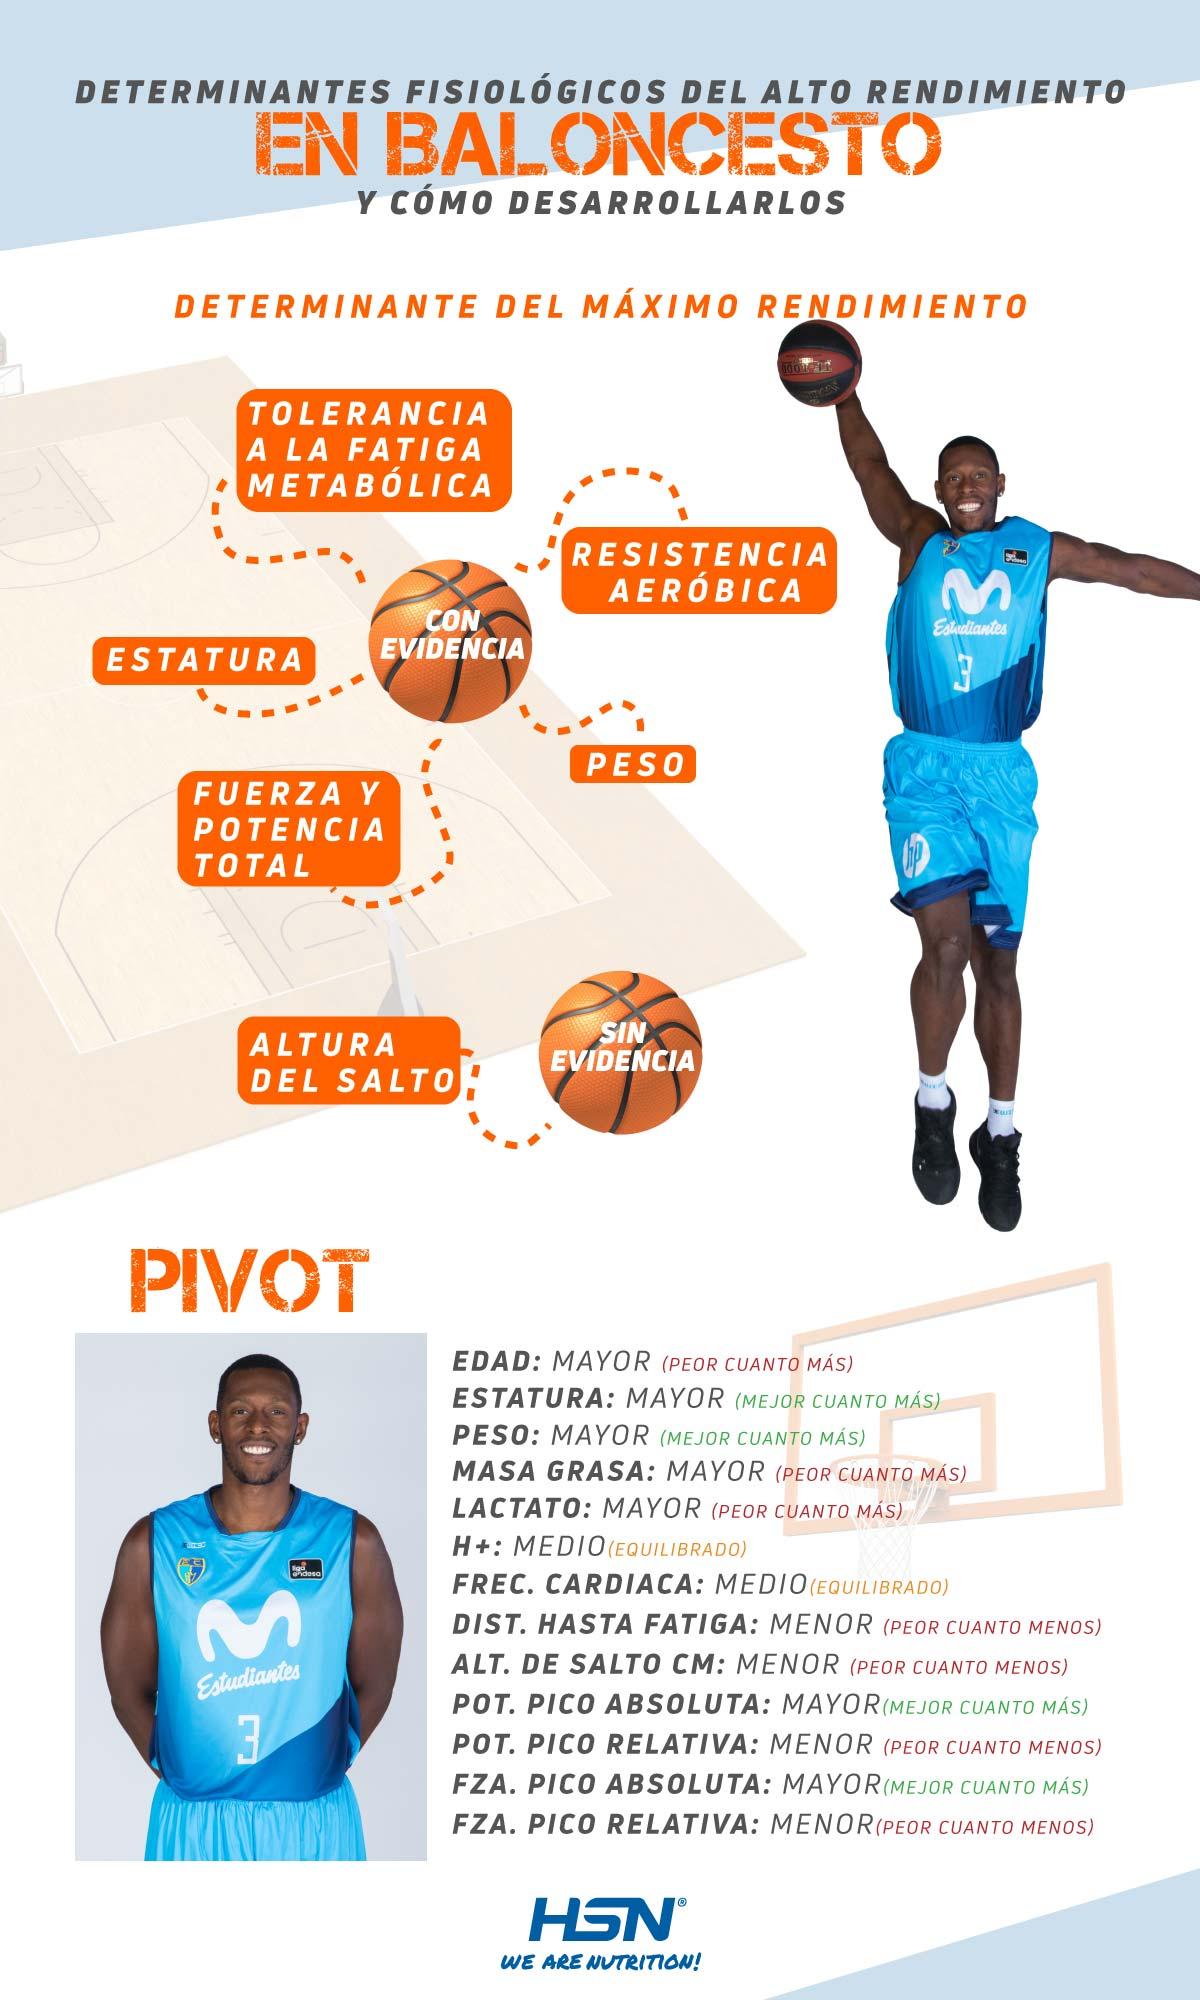 Determinantes Fisiológicas de Pívots en Baloncesto